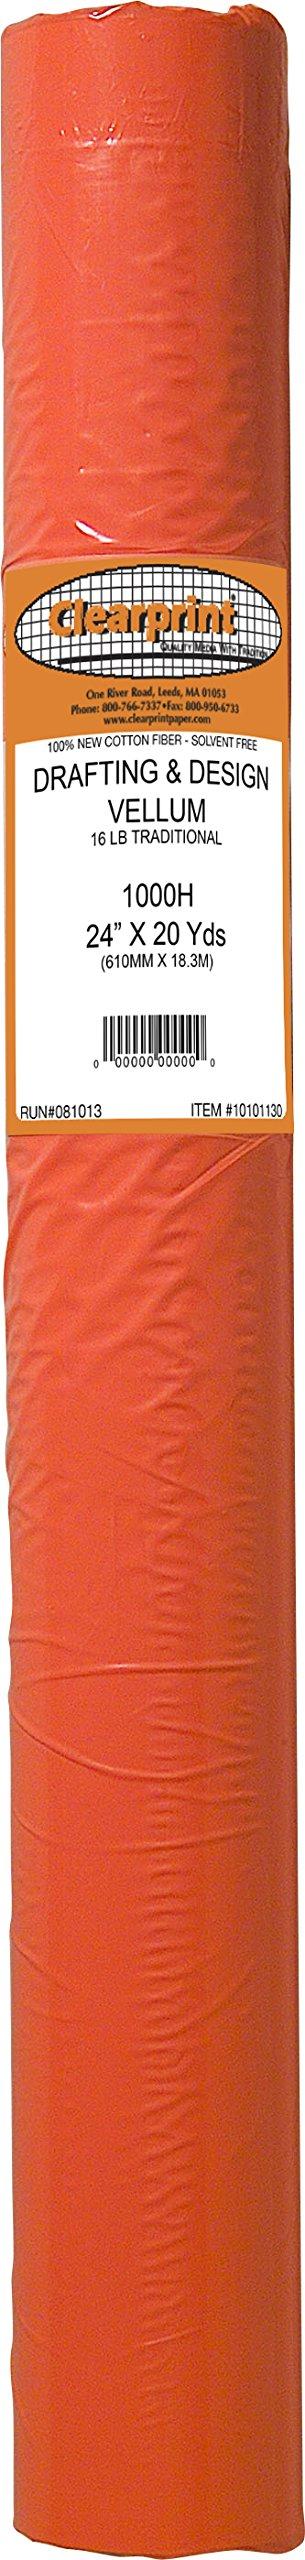 Clearprint 1000H Design Vellum Roll, 16 lb, 100% Cotton, 24 Inches W x 20 Yards Long, Translucent White, 1 Each (10101130)